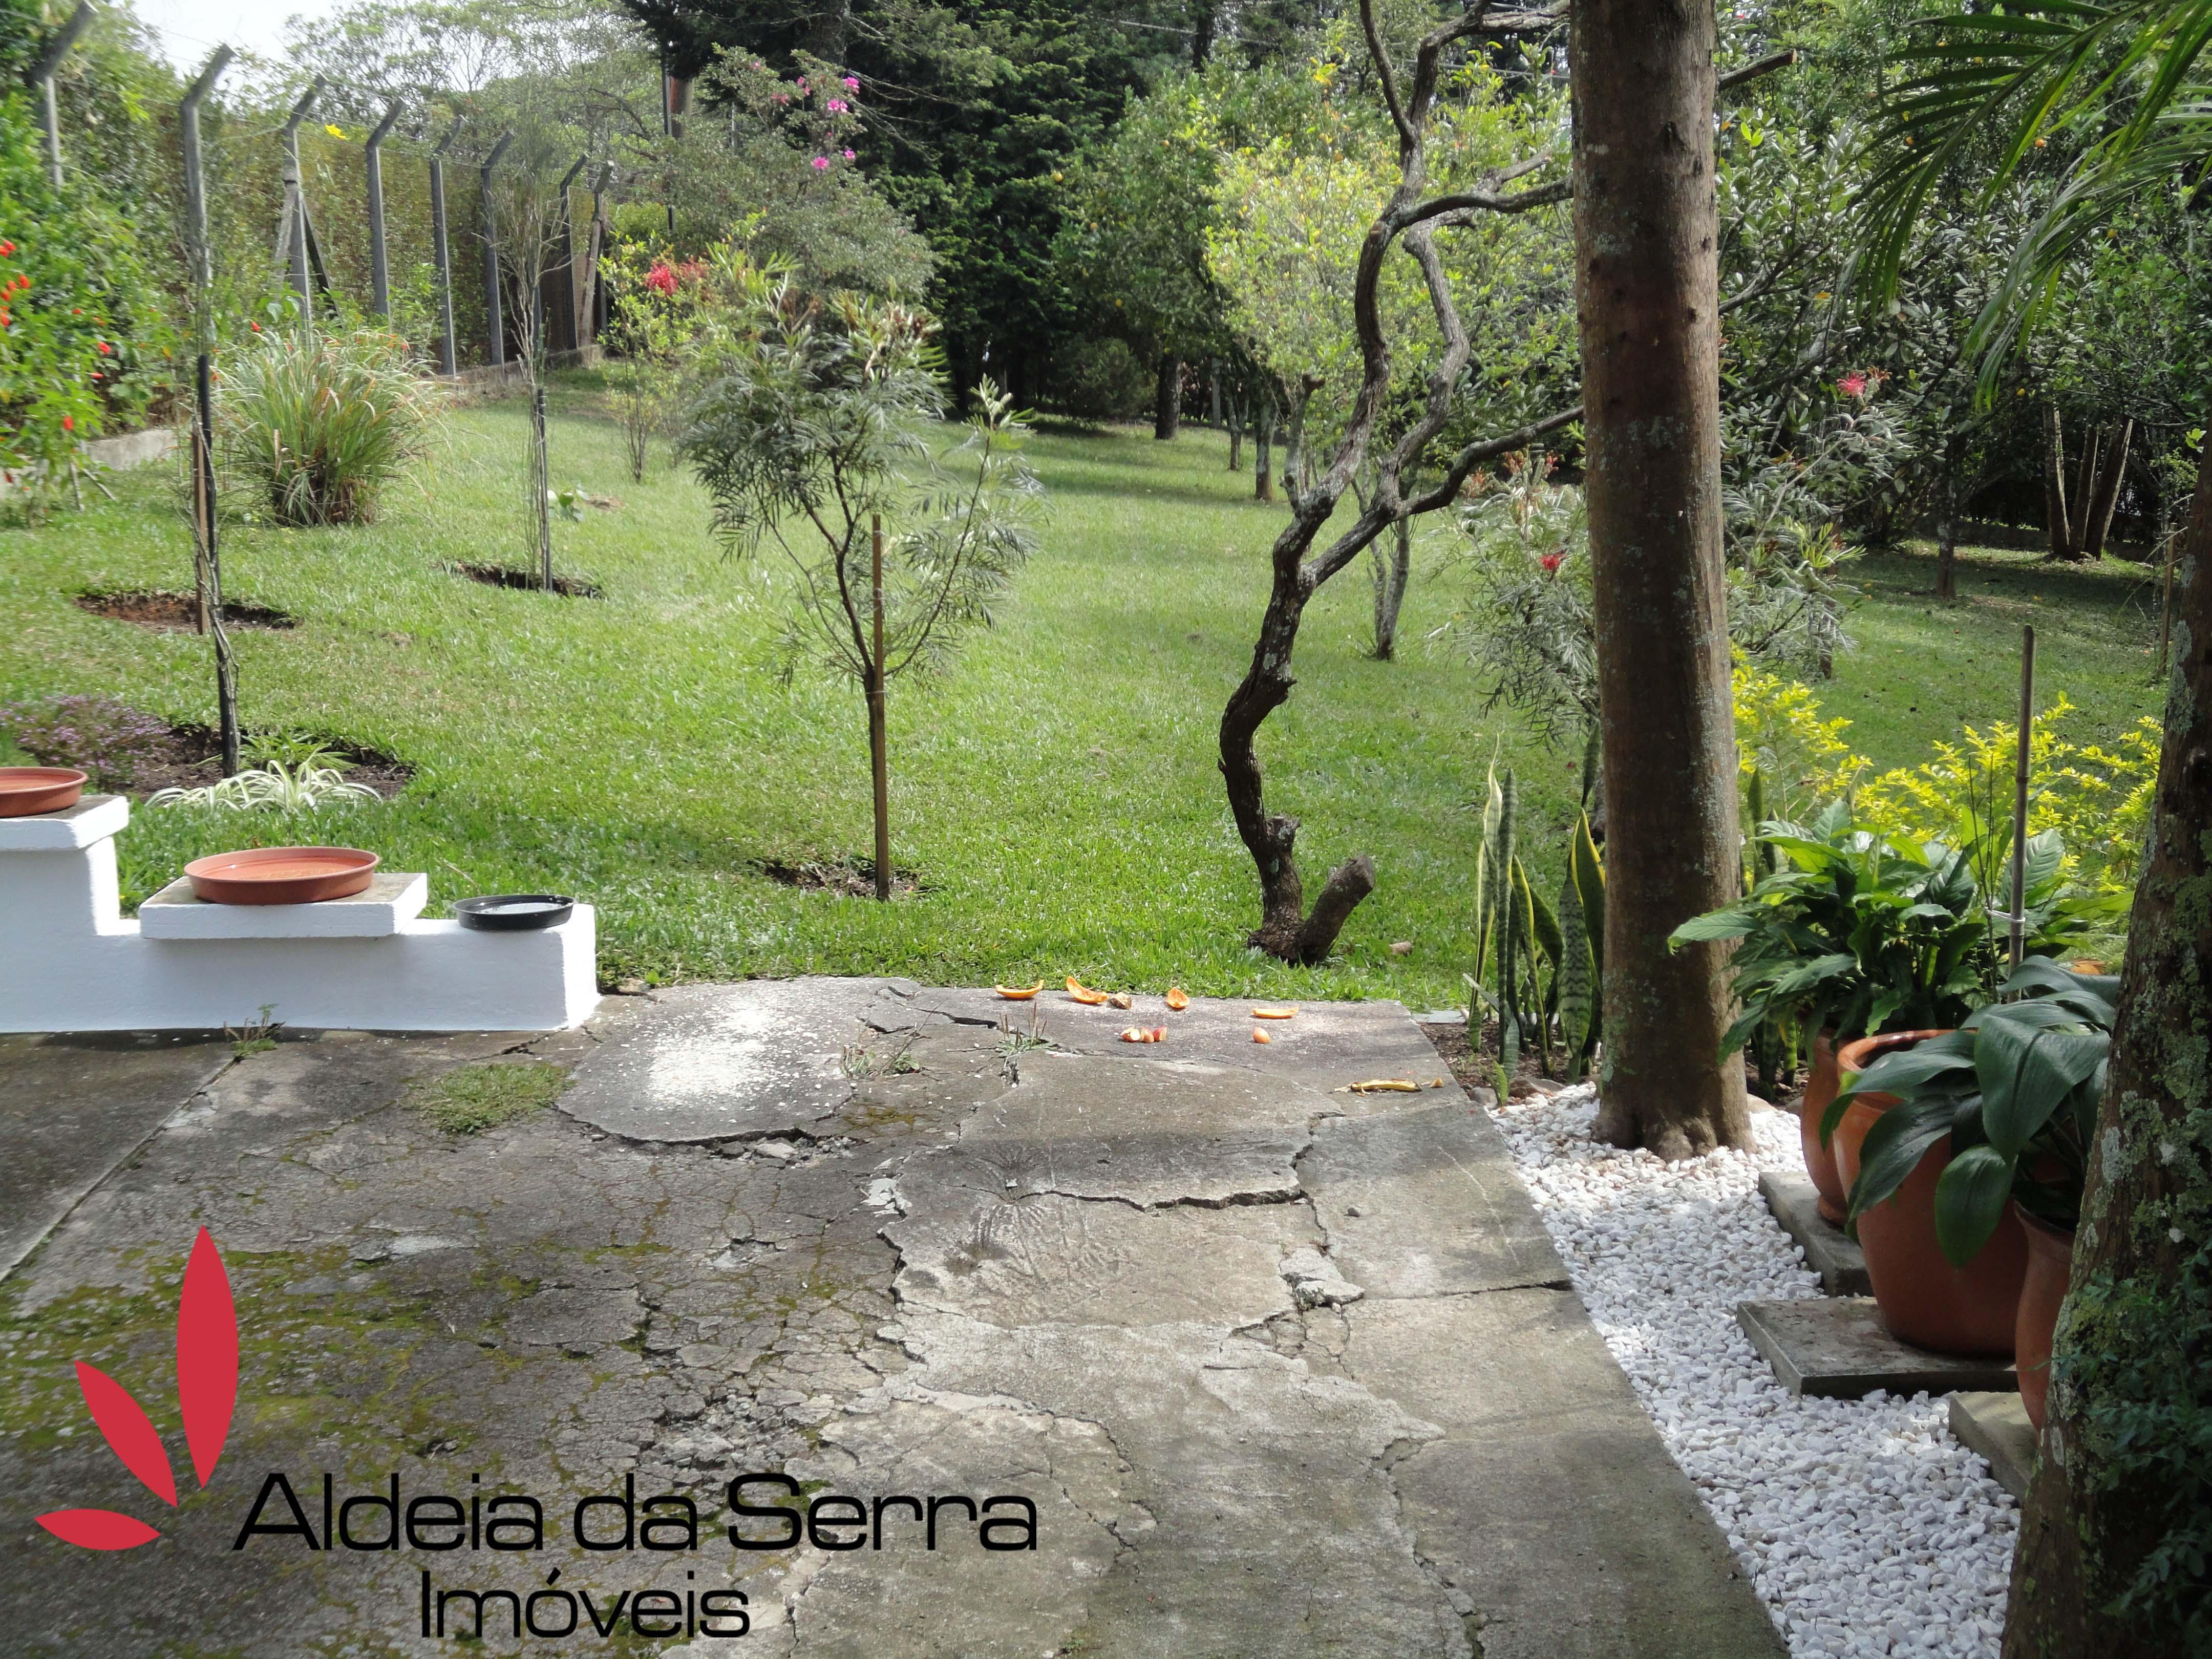 /admin/imoveis/fotos/DSC00023.JPG Aldeia da Serra Imoveis